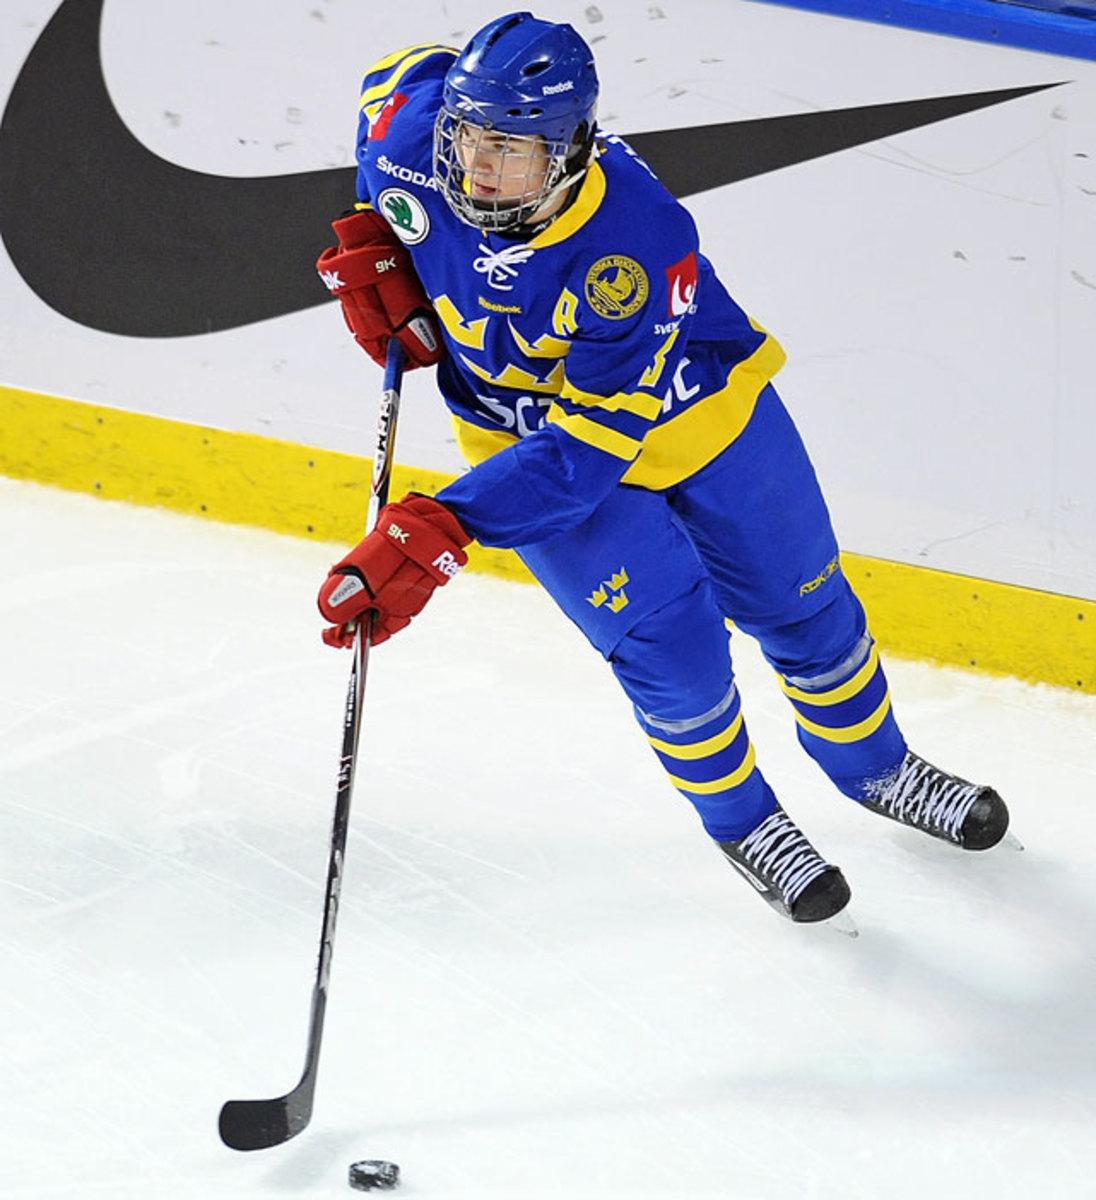 Ludvig Bystrom